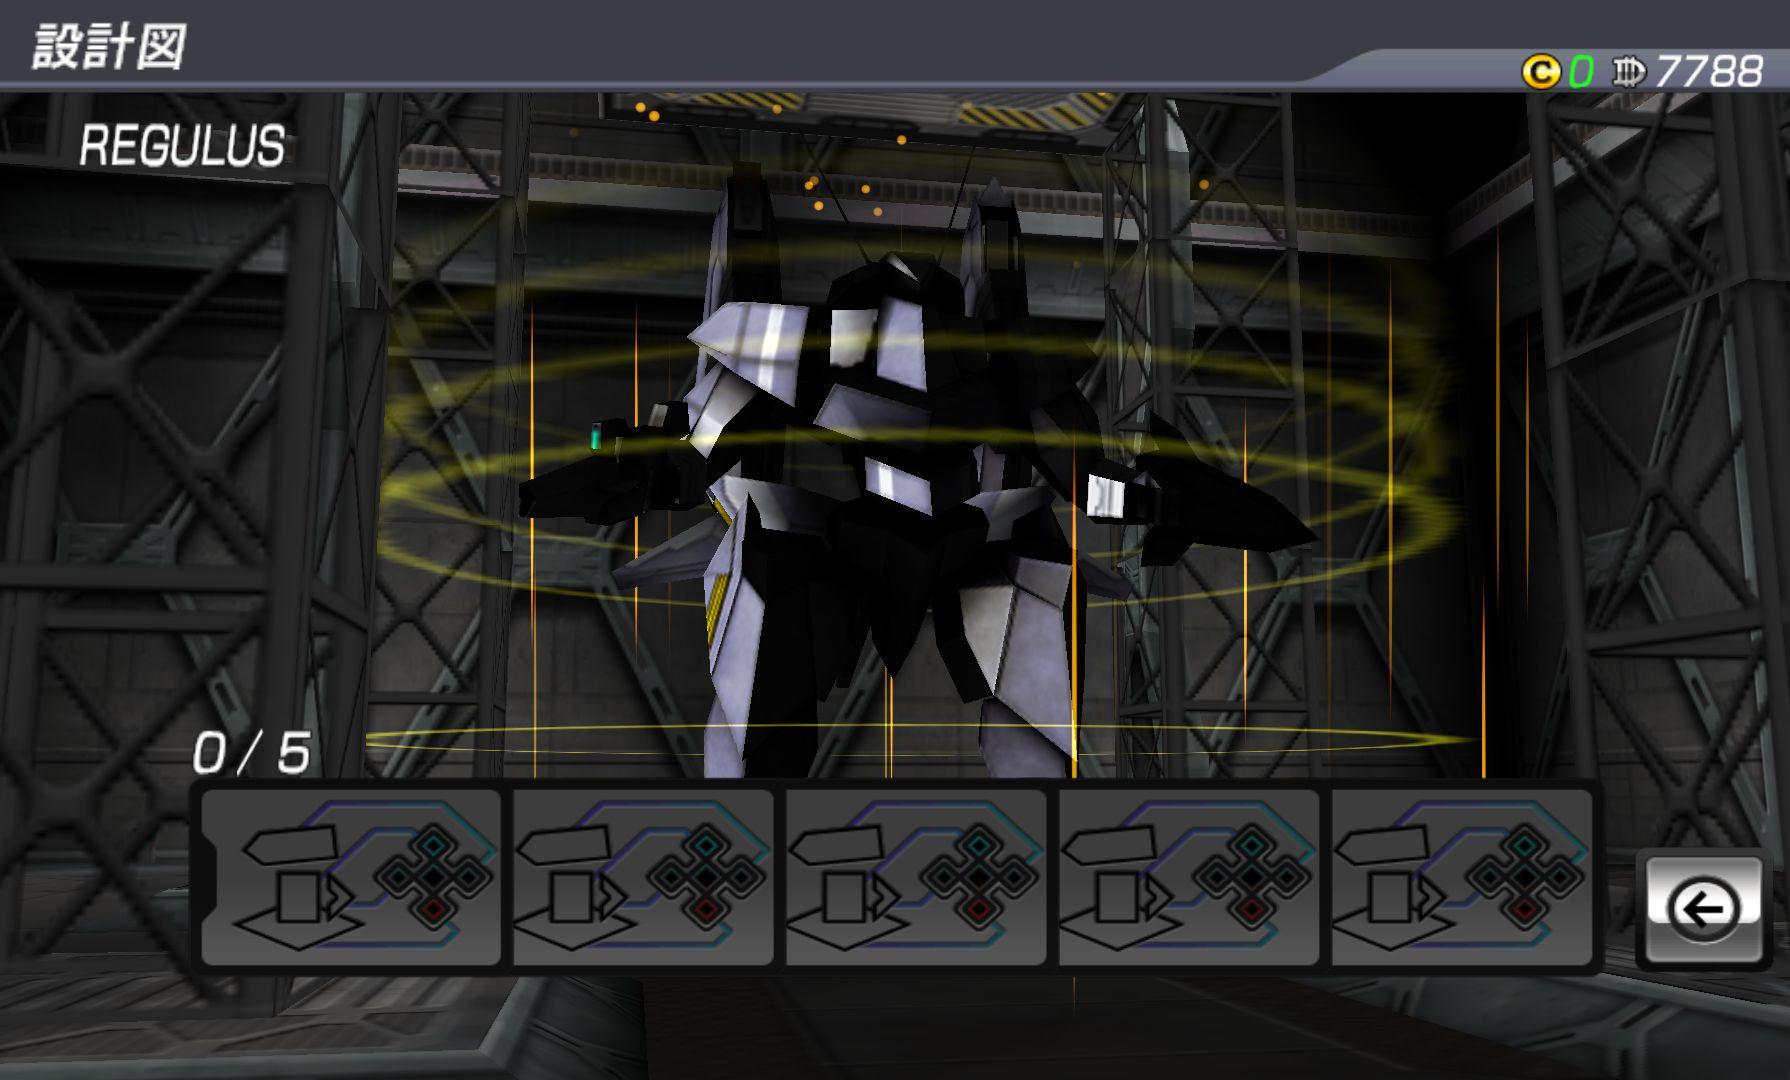 androidアプリ デストロイ・ガンナーズ シグマ(Destroy Gunners Σ)攻略スクリーンショット5